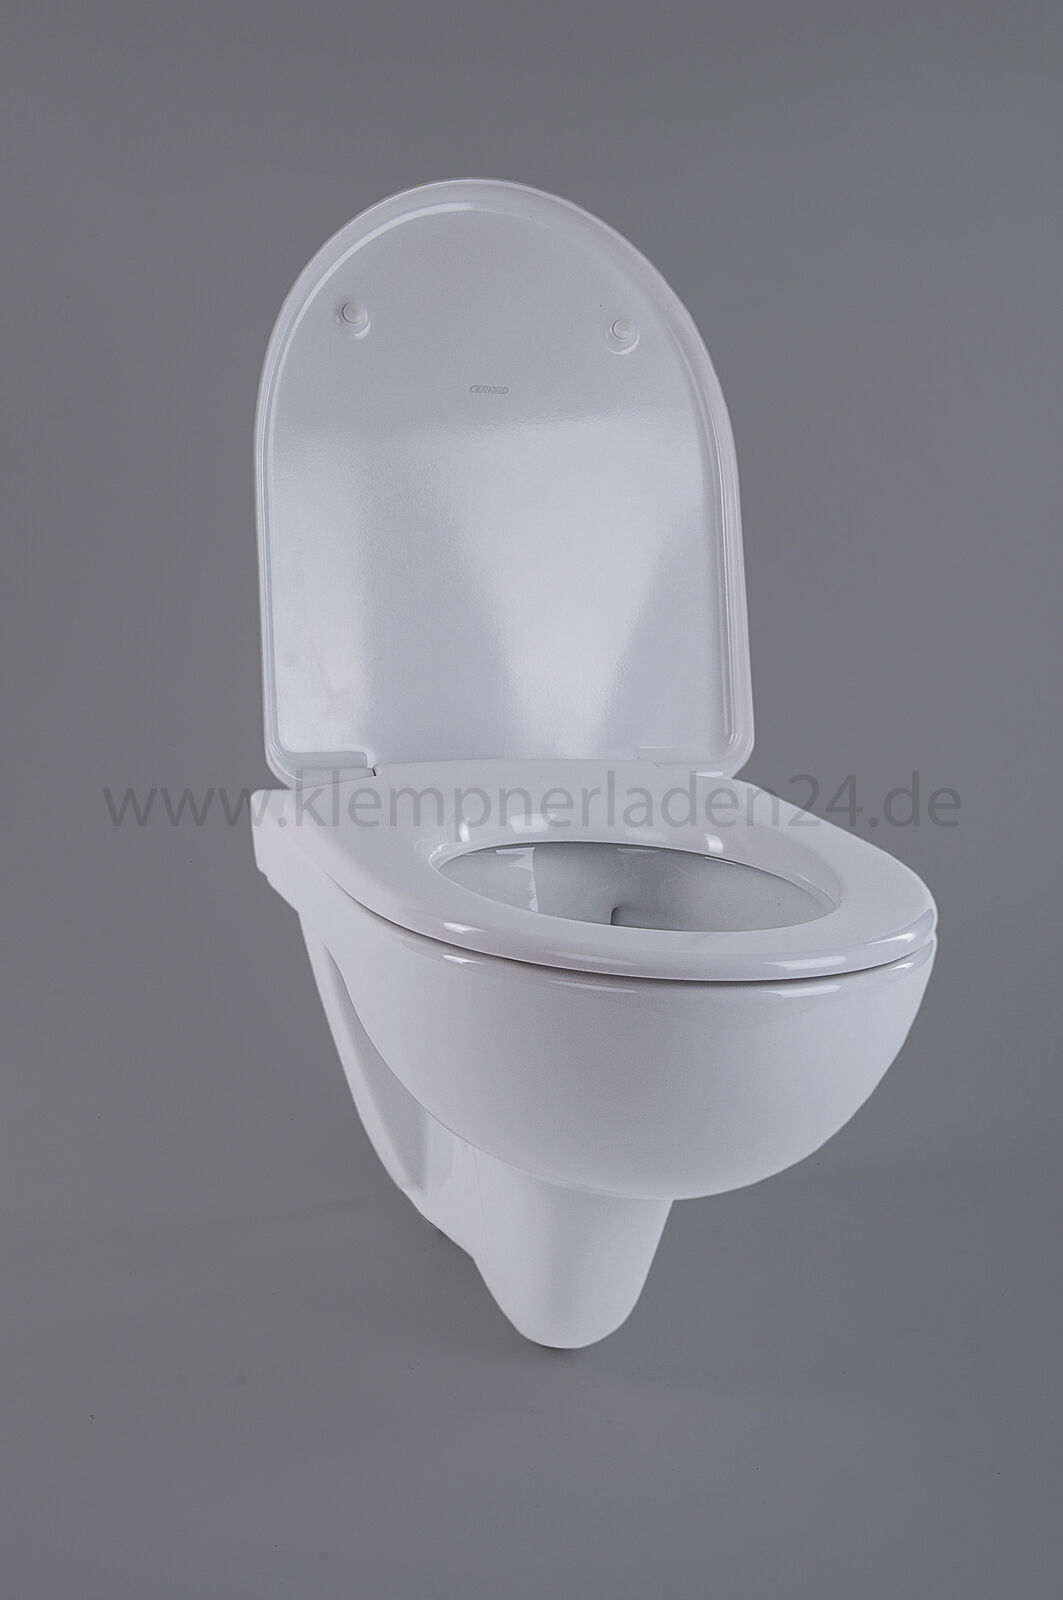 rimfree wc set wisa wc vorwandelement xssu wand wc. Black Bedroom Furniture Sets. Home Design Ideas